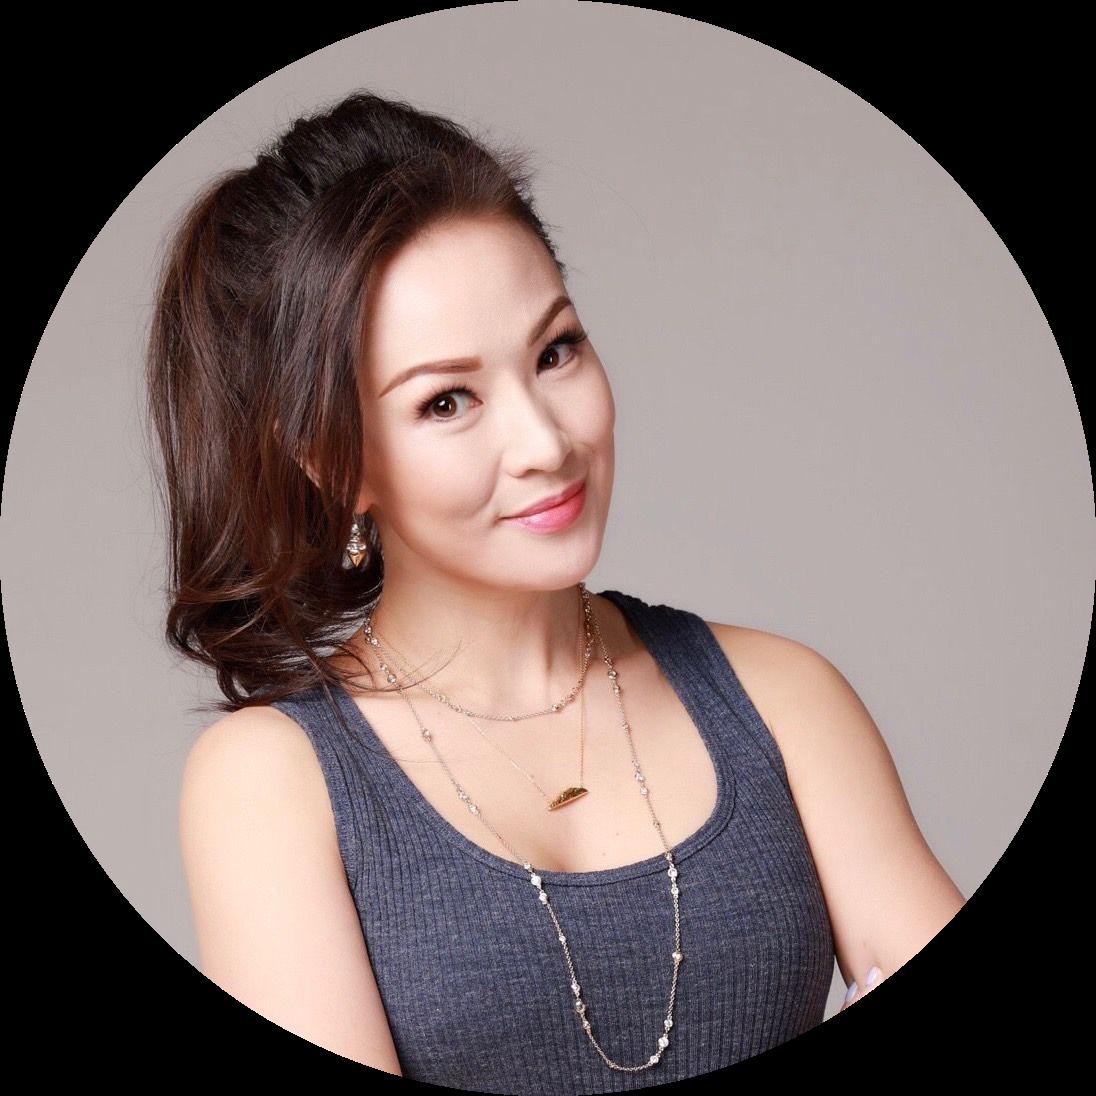 Jennifer Hsiung